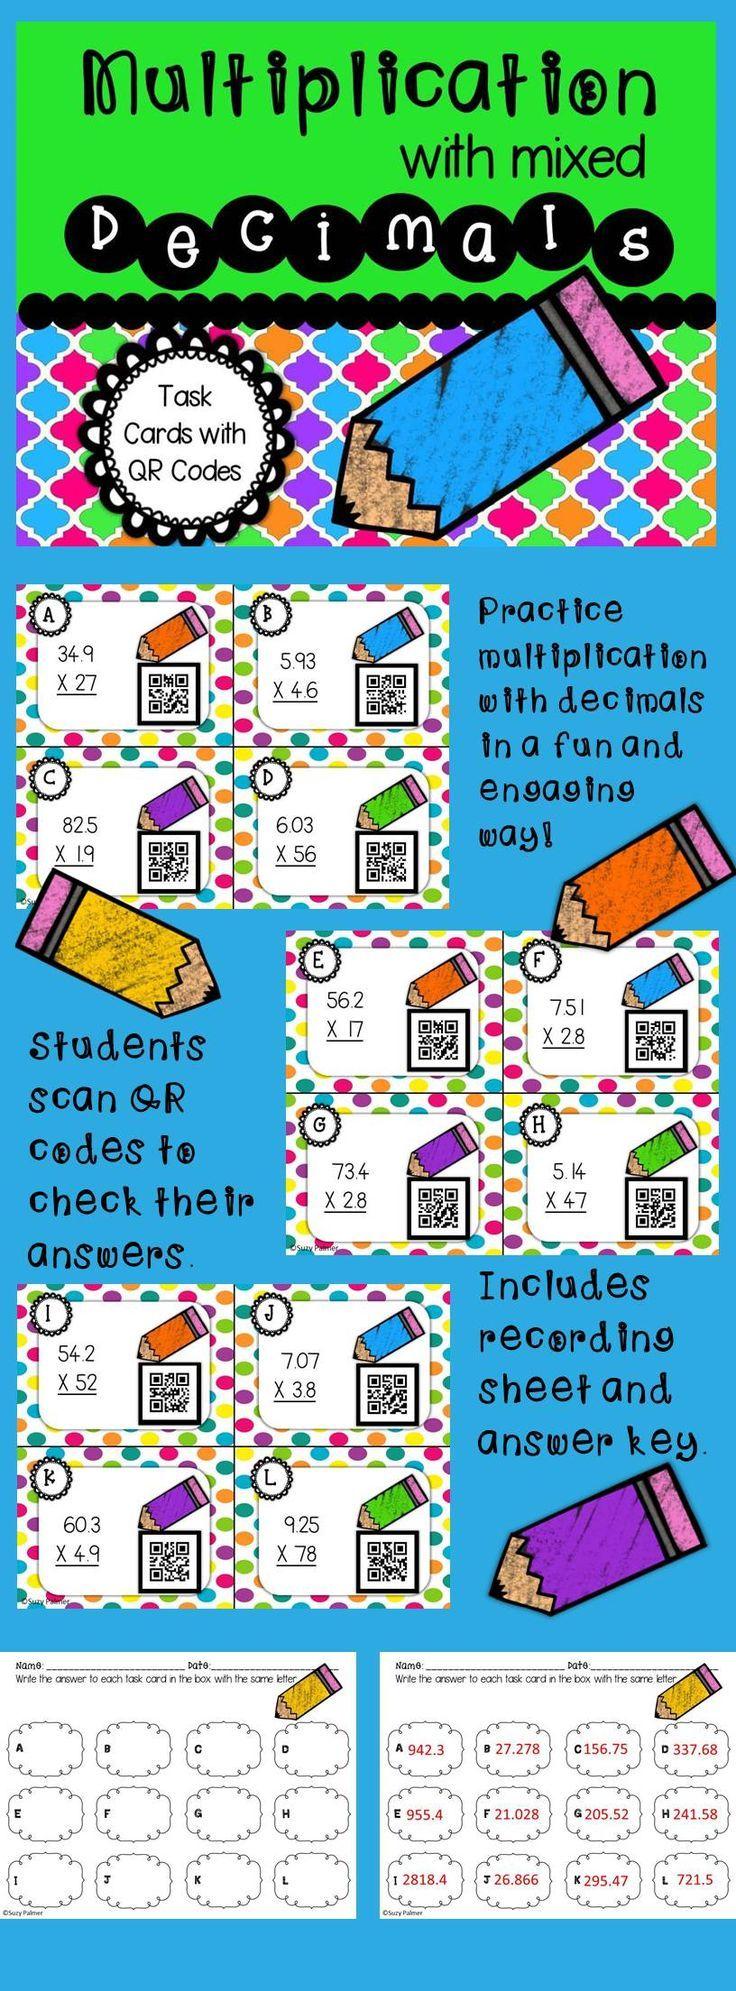 87 best 5th grade math images on Pinterest   Teaching ideas, Basic ...